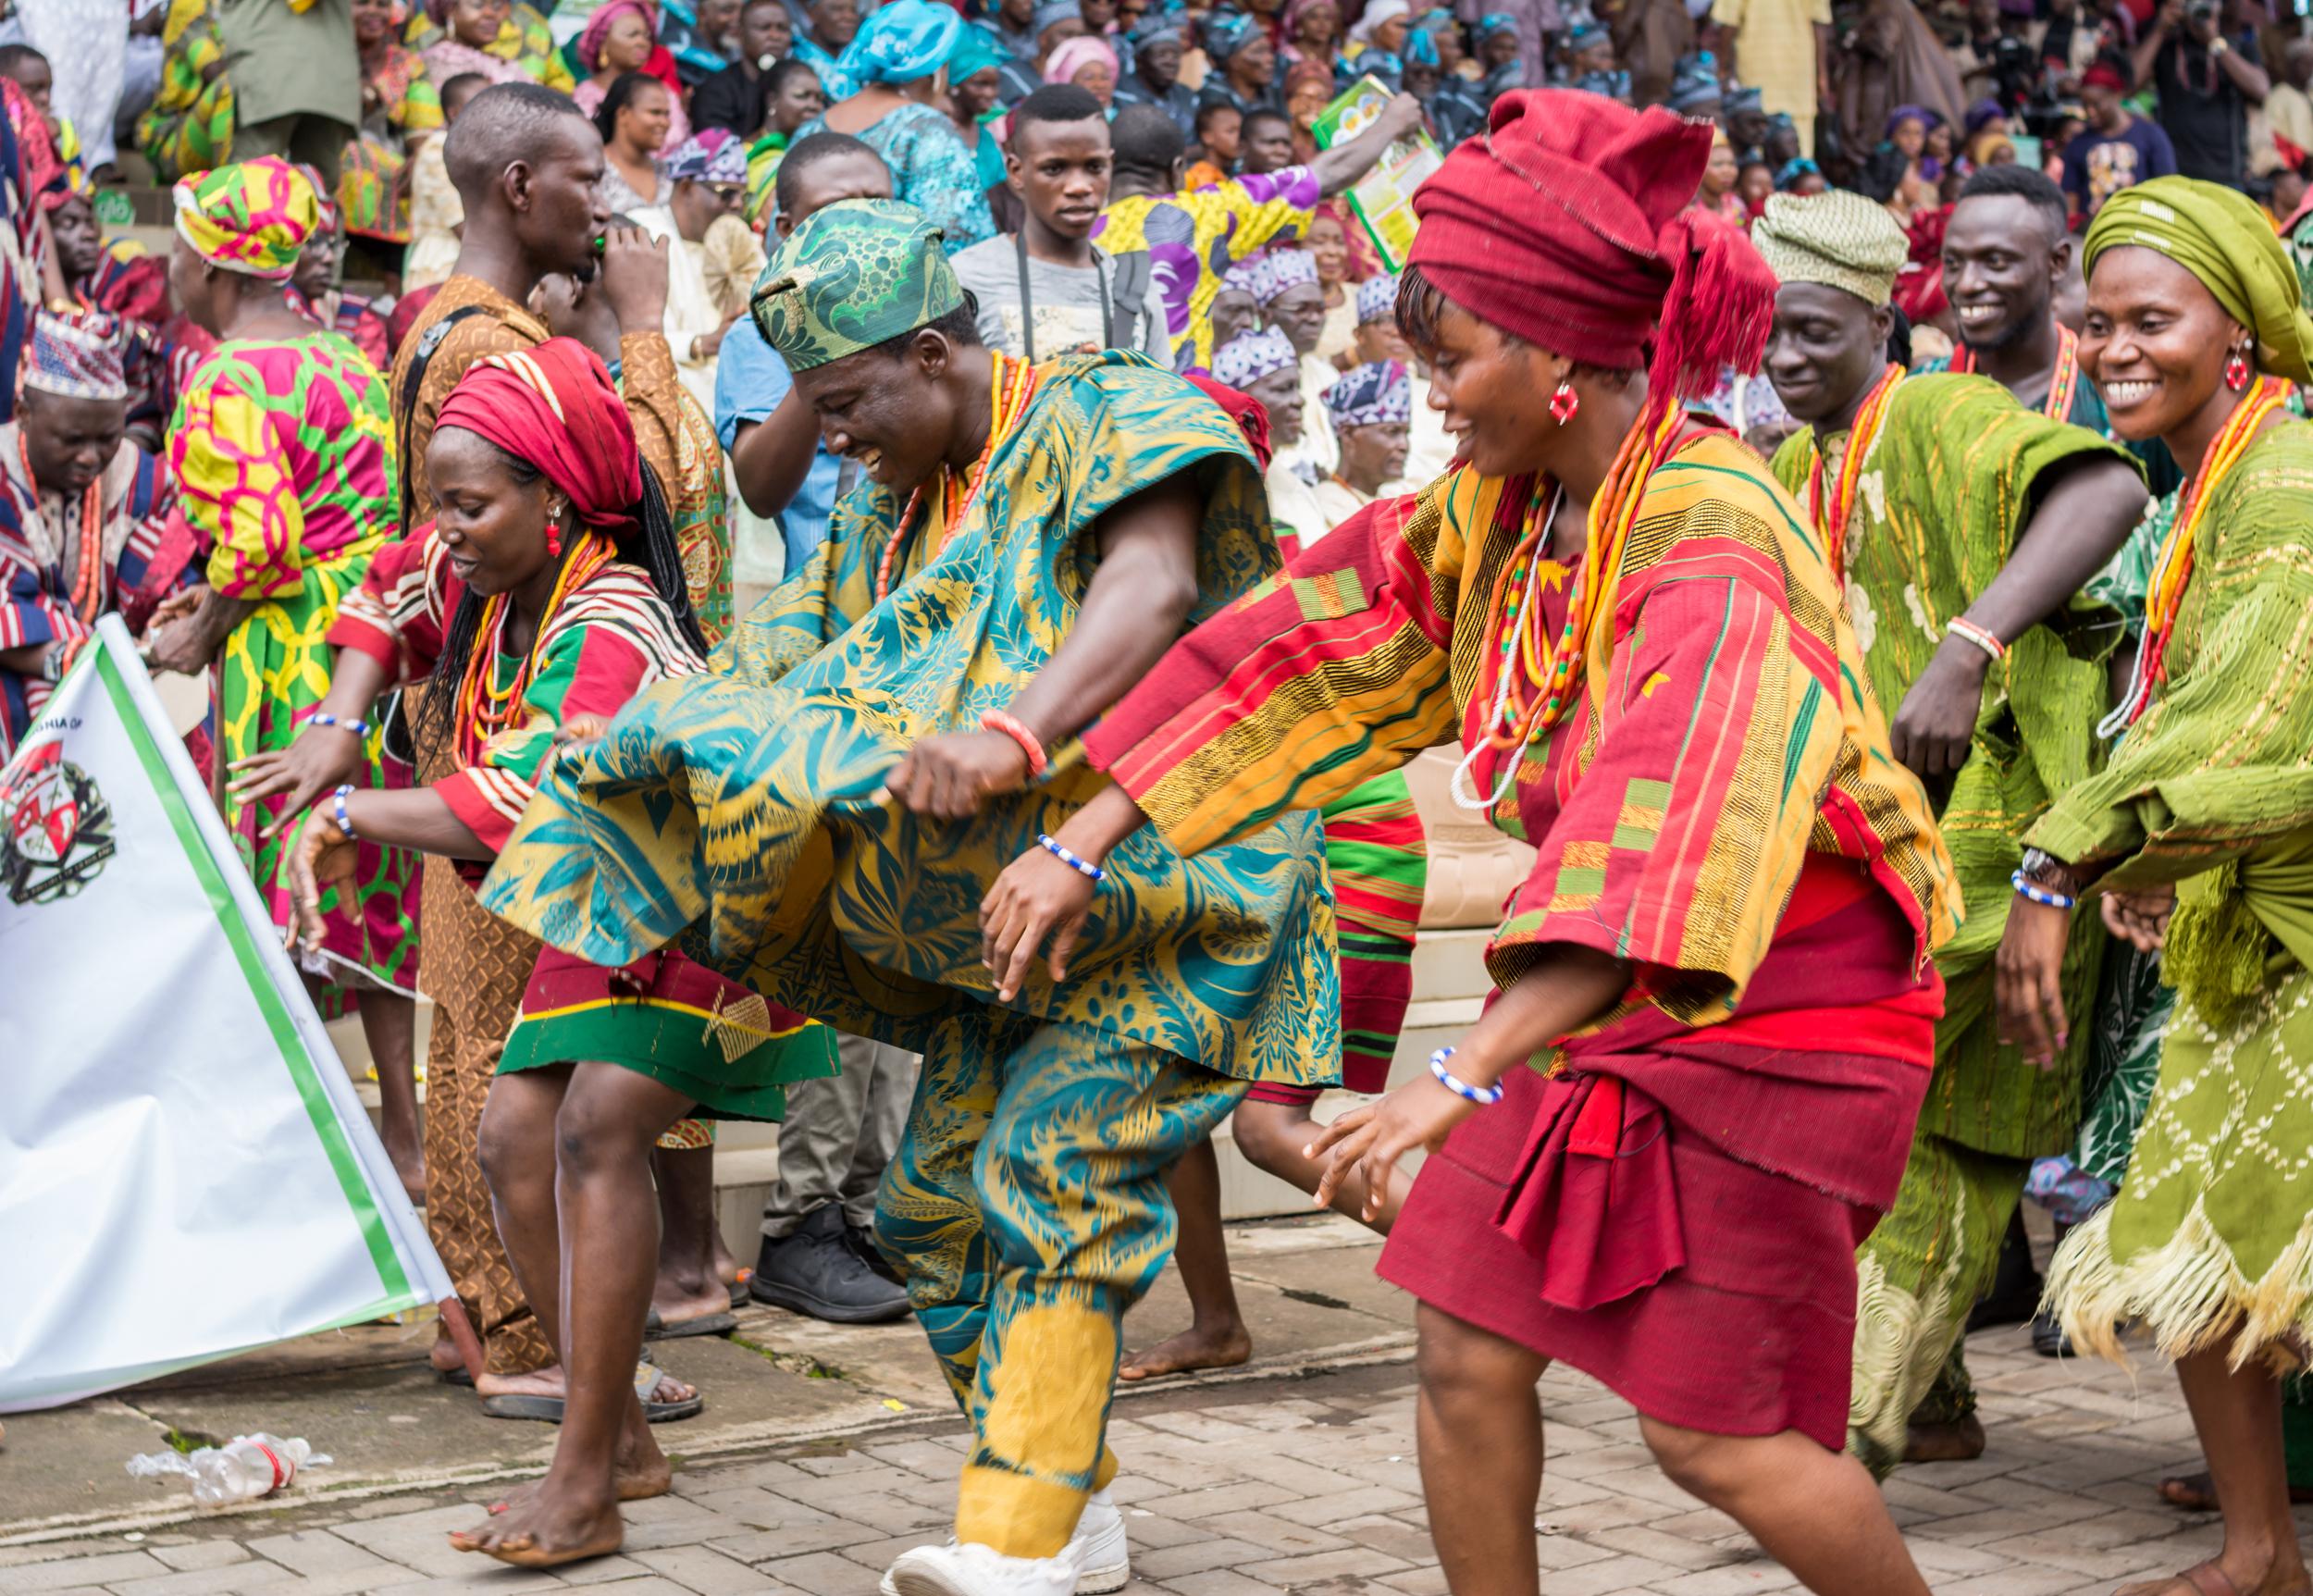 Members of a cultural troupe dances to entertain spectators during the Ojude Oba festival in Ijebu Ode, Ogun State.